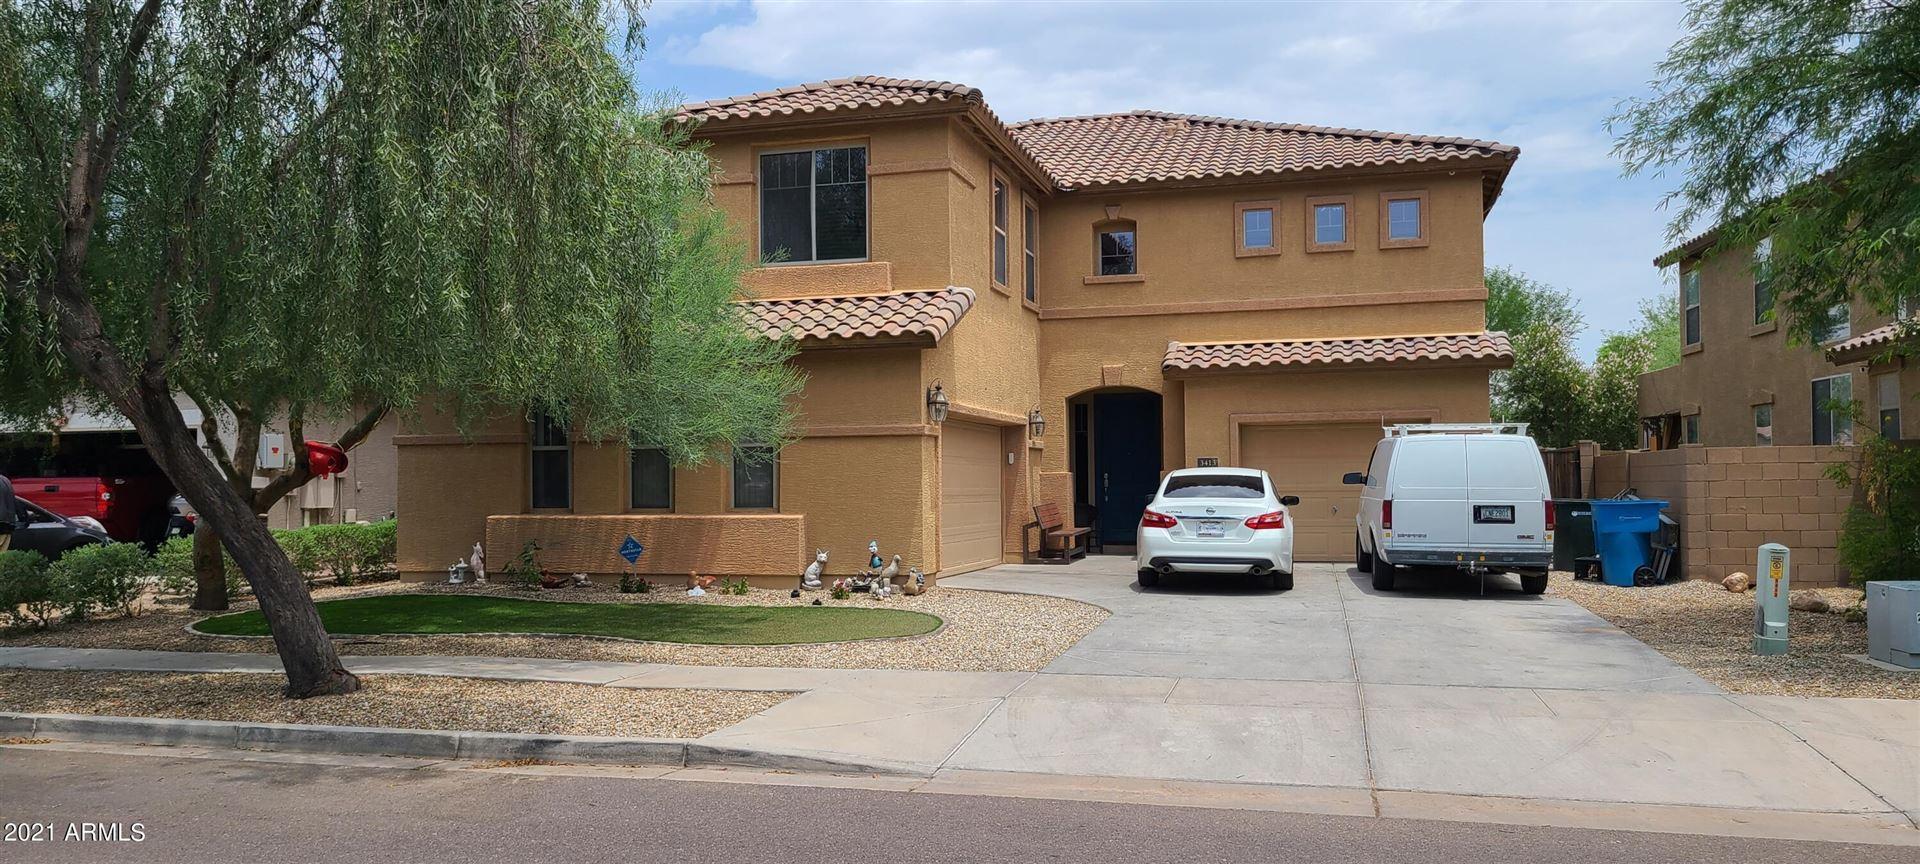 Photo of 3413 S 90TH Avenue, Tolleson, AZ 85353 (MLS # 6270109)